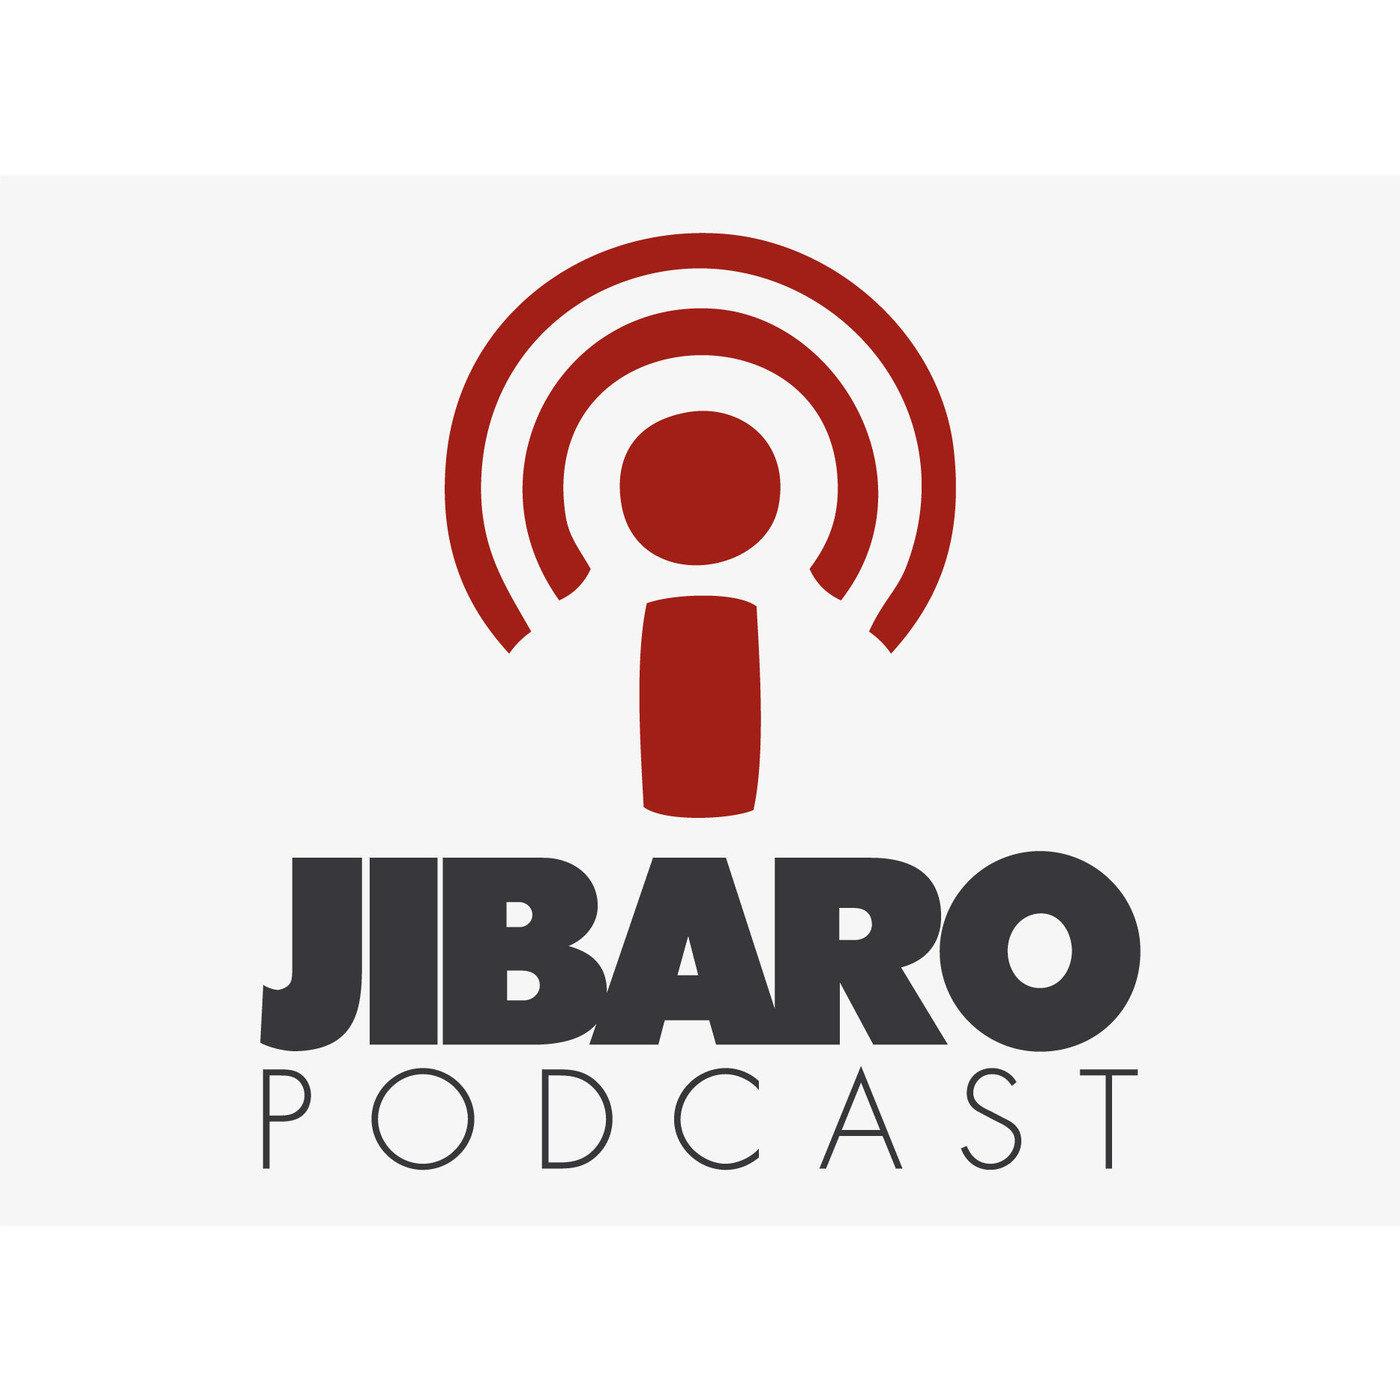 <![CDATA[Jibaro Podcast]]>